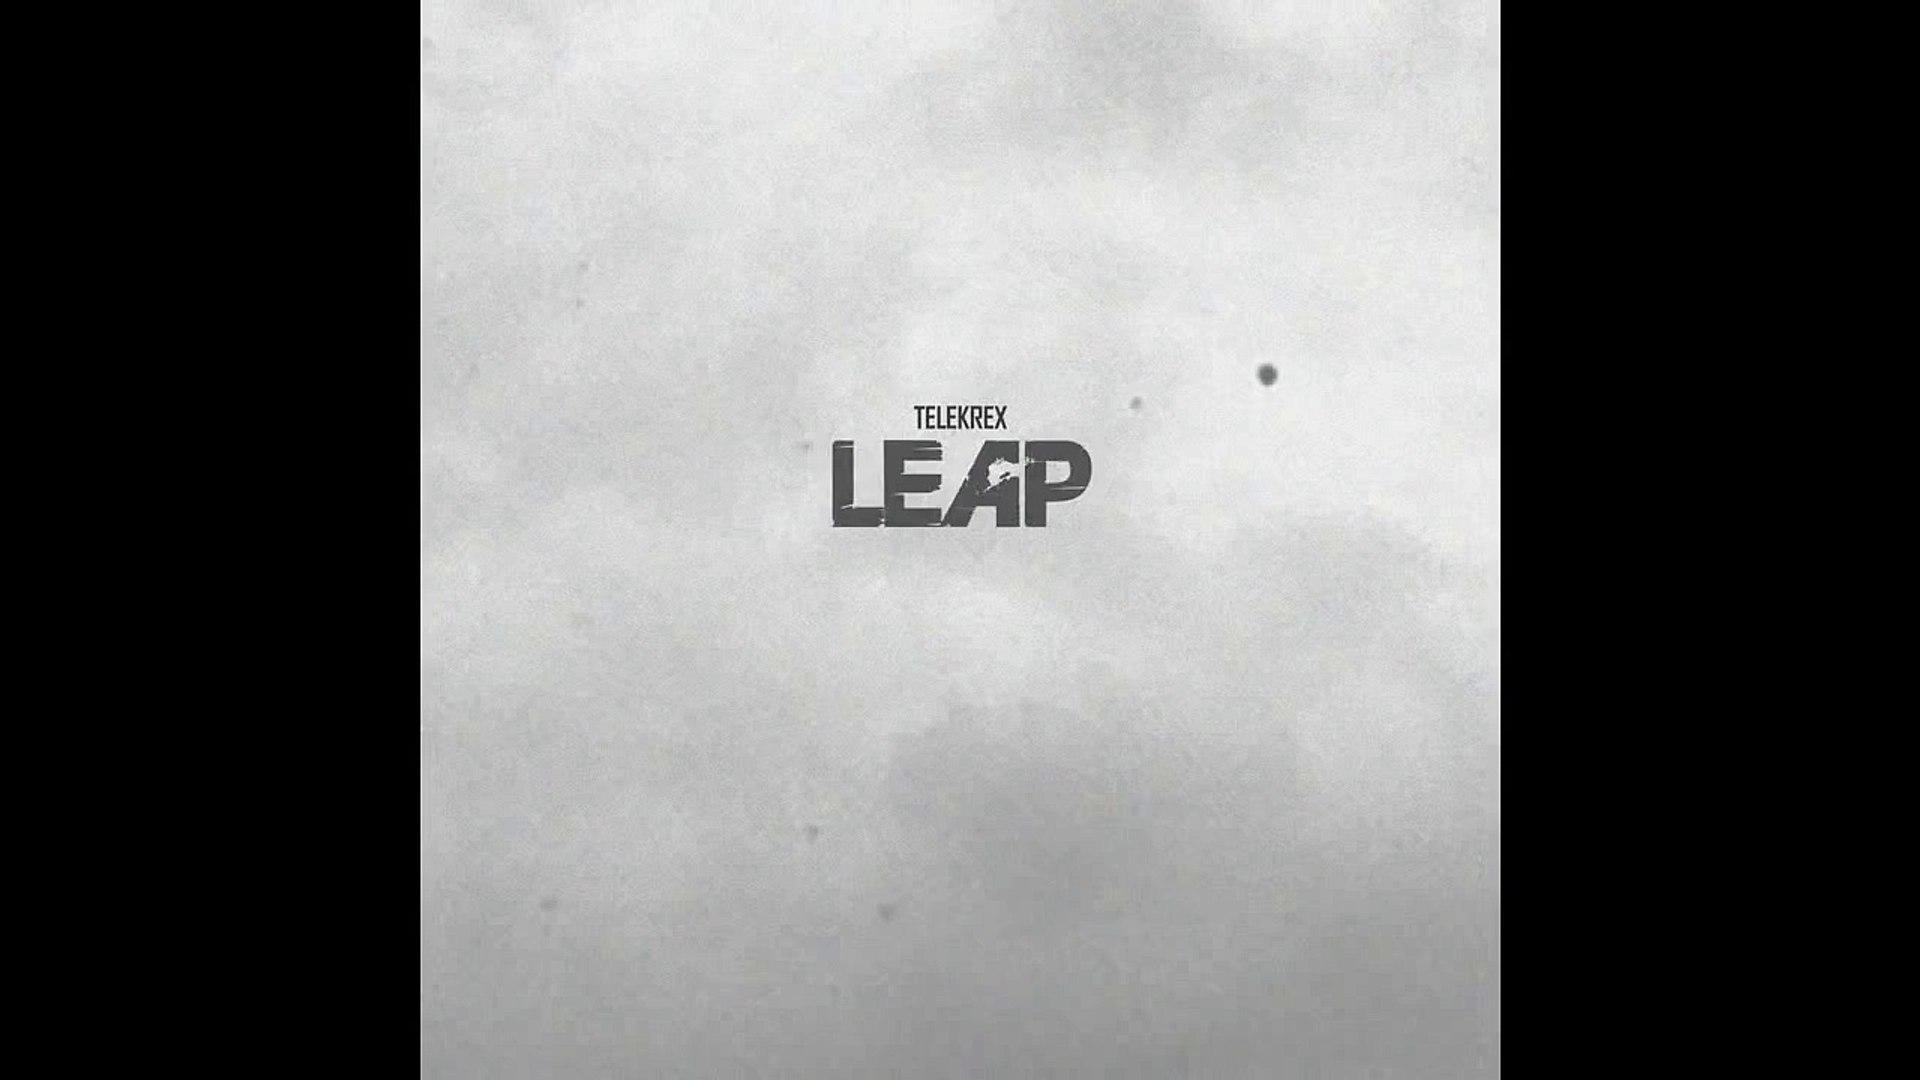 Telekrex - Leap (Surreal Electronic Soul Music)